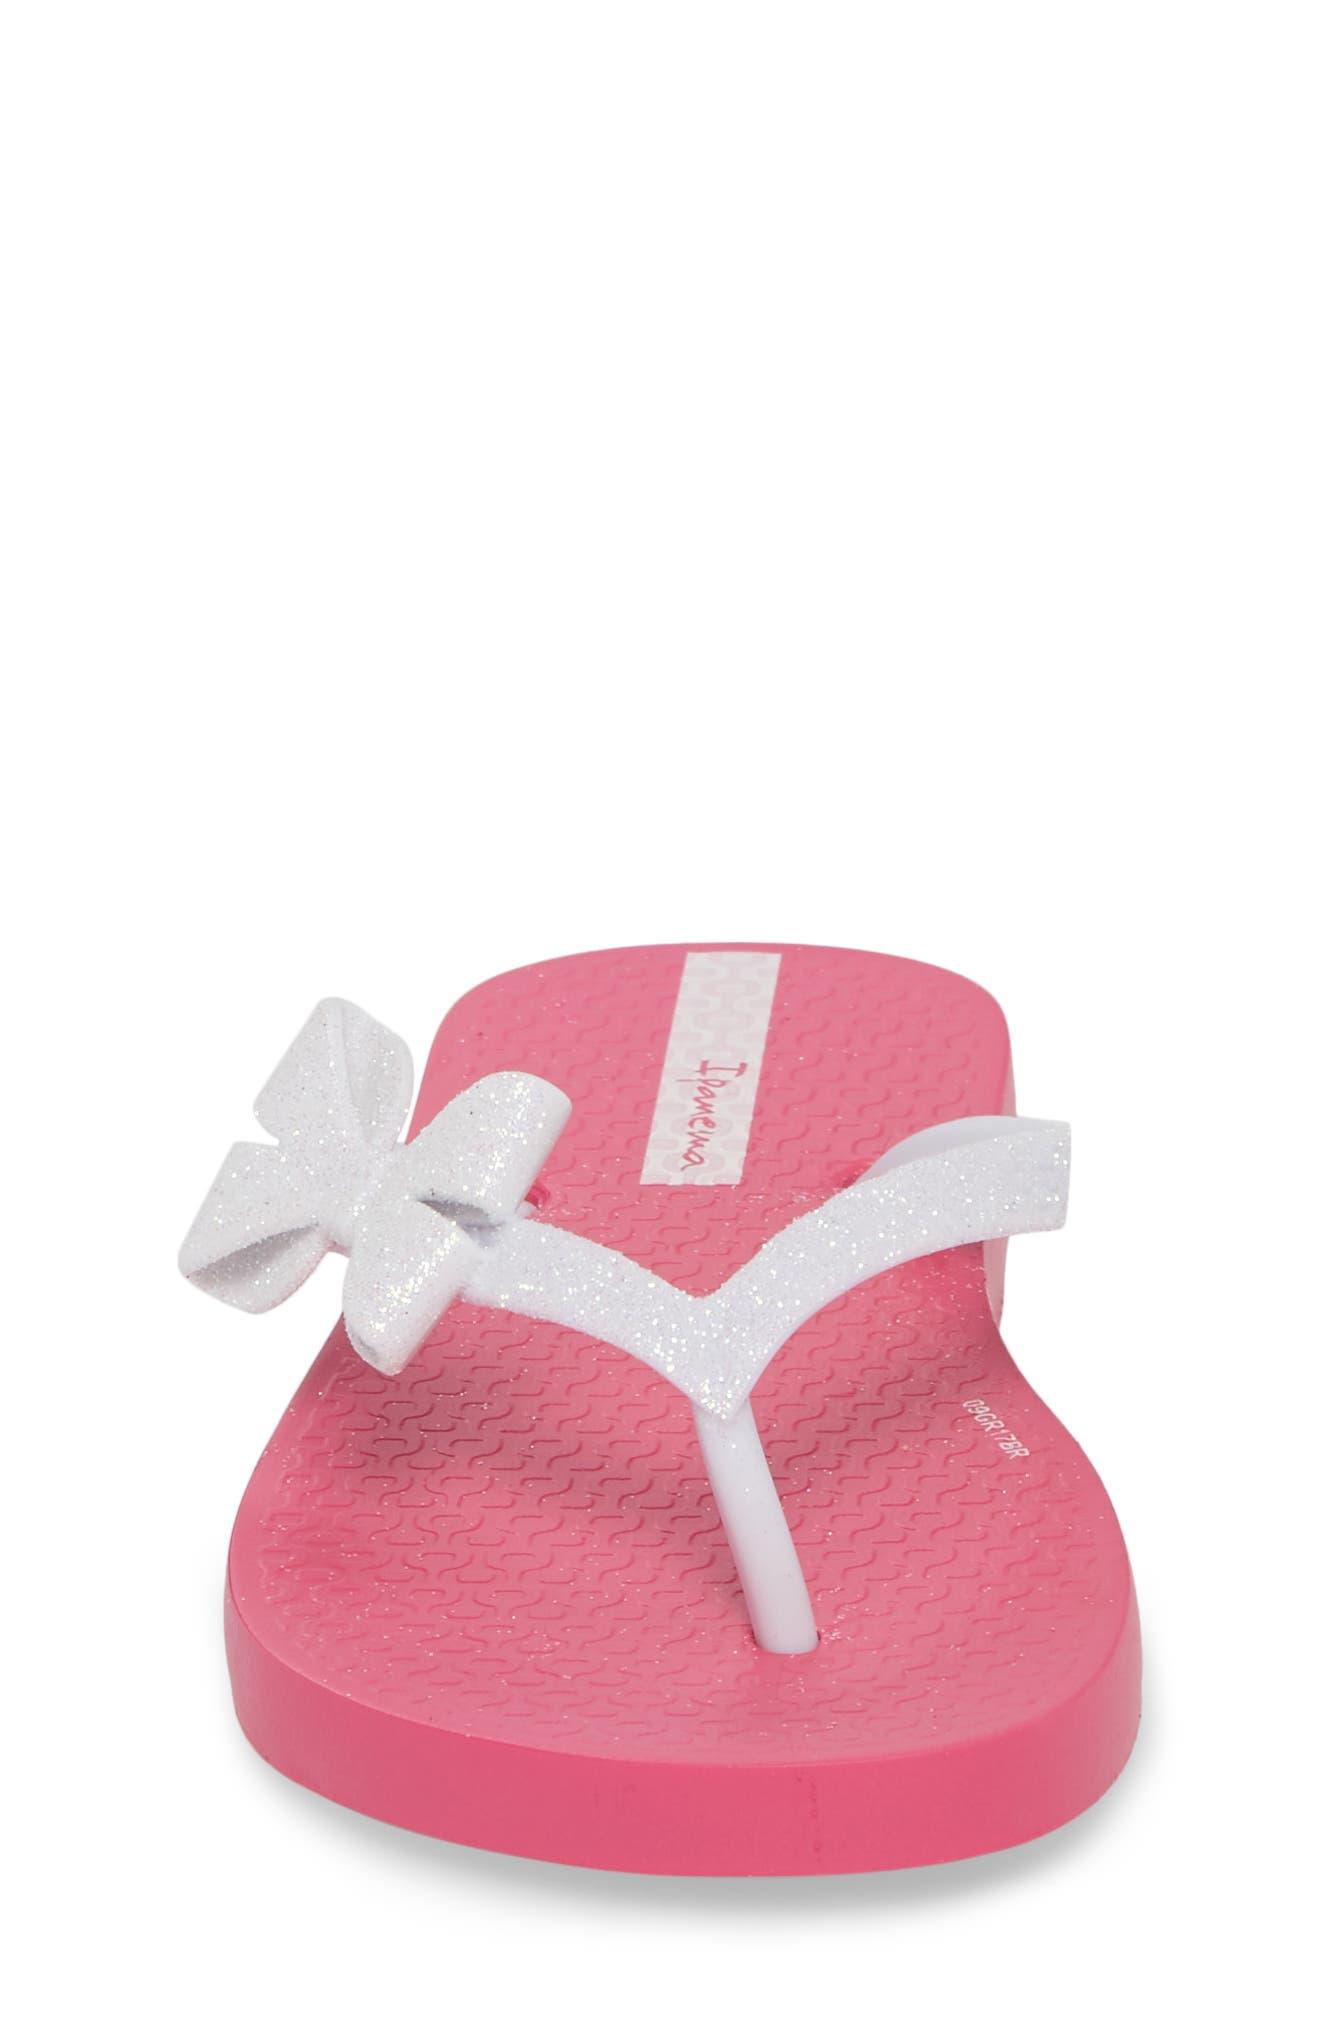 Glitter IV Flip Flop,                             Alternate thumbnail 4, color,                             Pink/ White